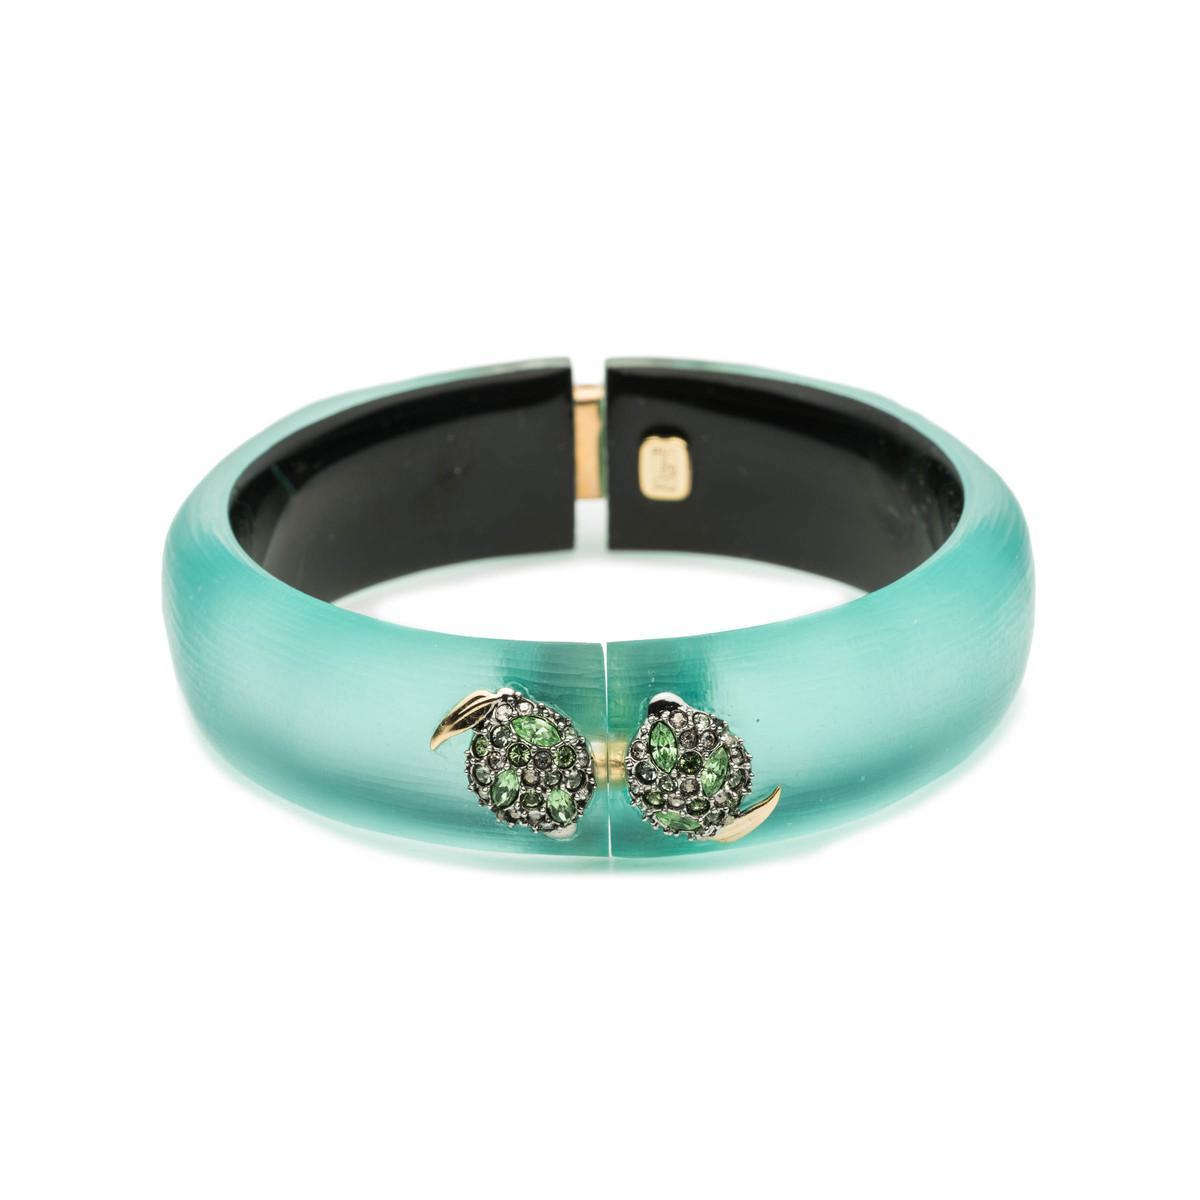 Alexis Bittar Crystal Encrusted Lime Studded Hinge Bracelet Mint green jn0bYV